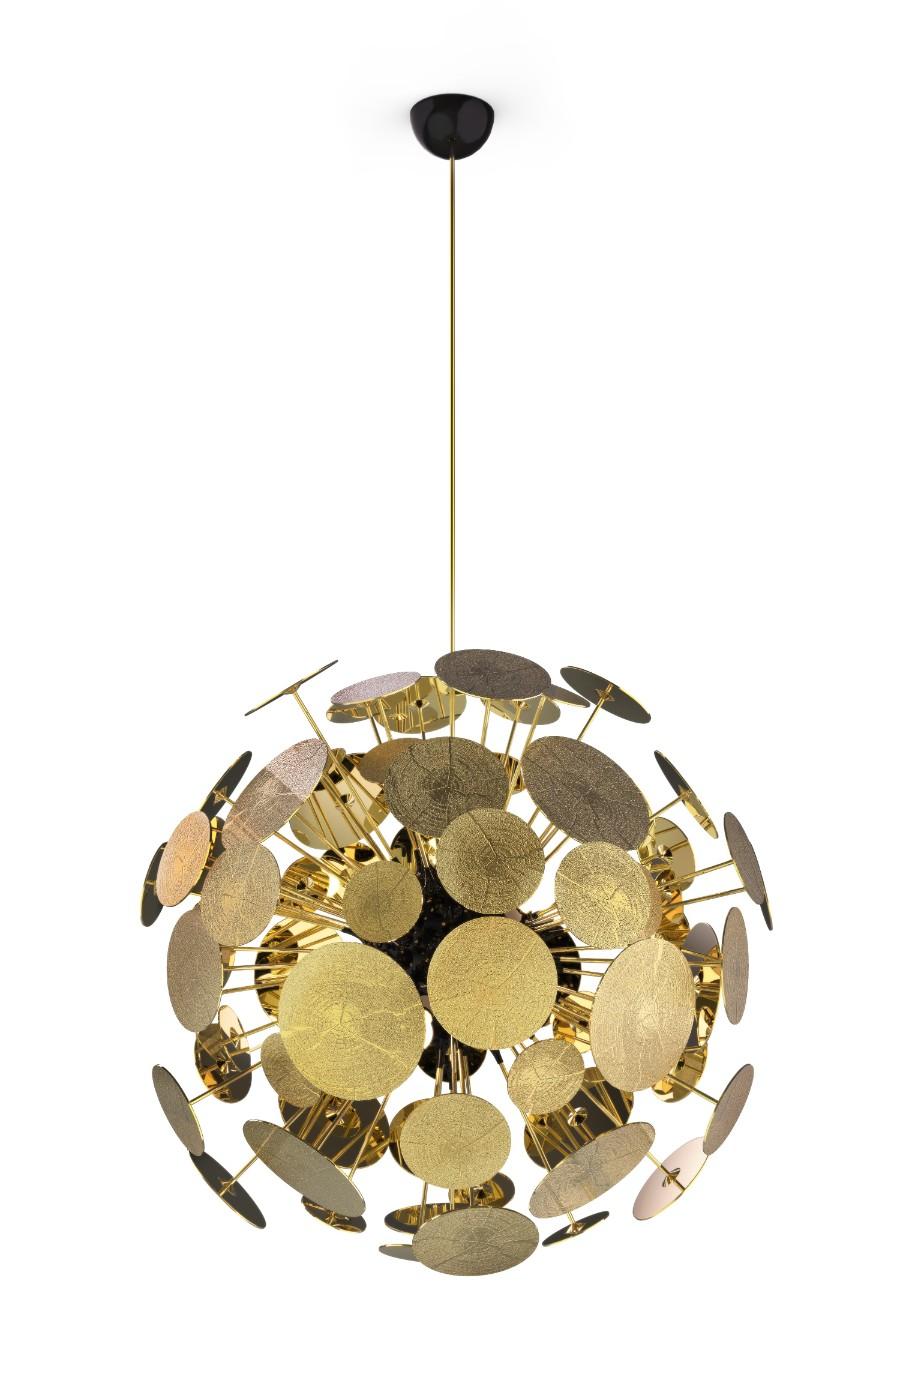 luxury furniture Discover Boca do Lobo's Luxury Furniture: Newton Family newton supension lamp 01